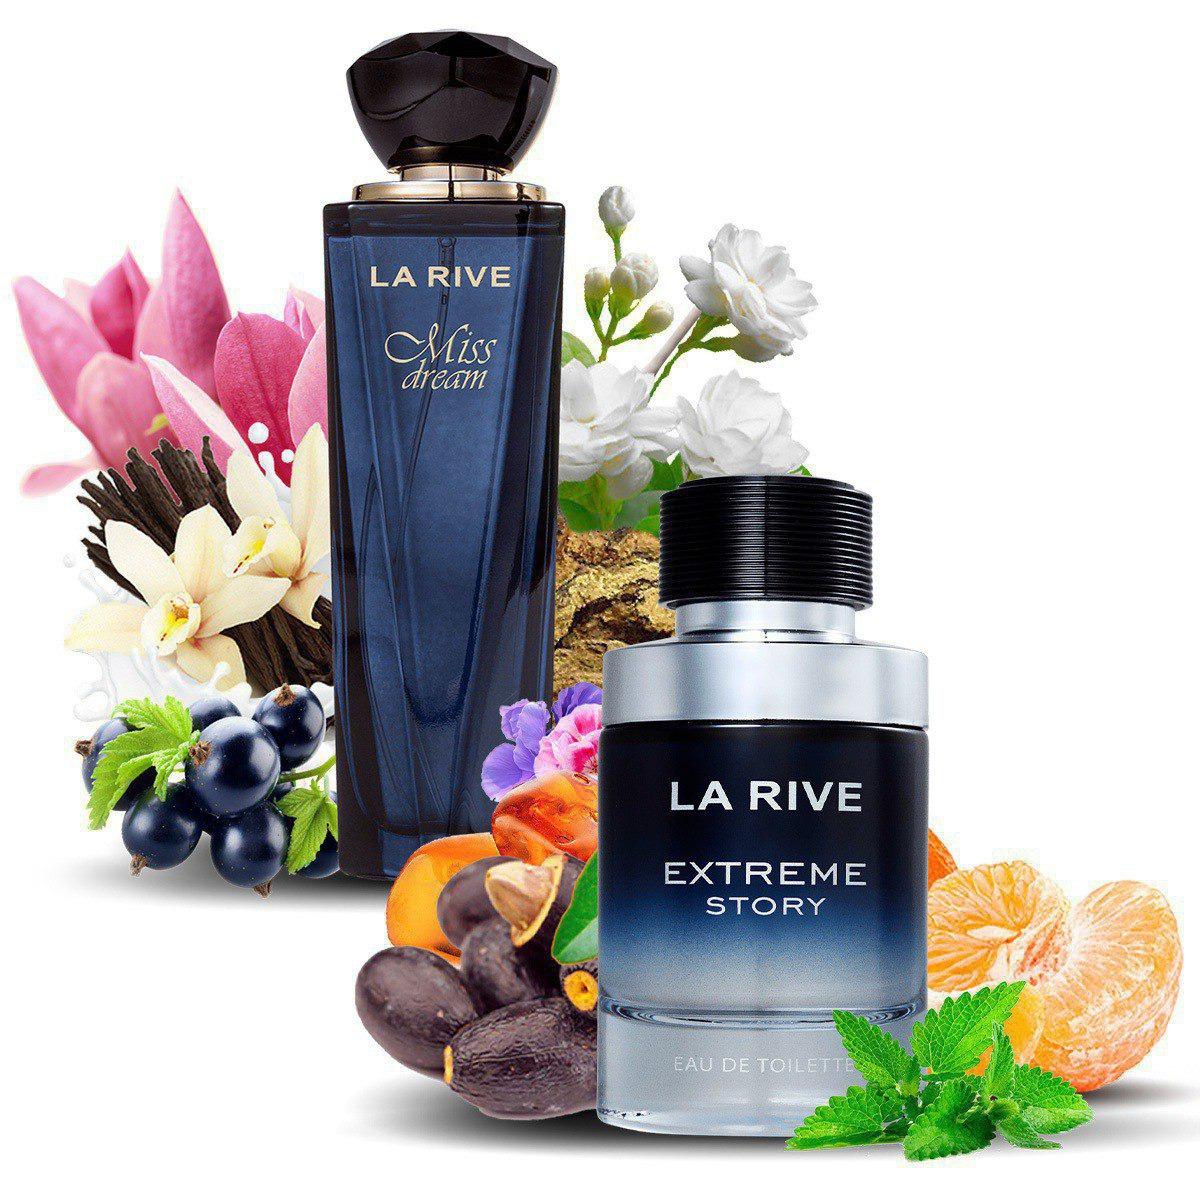 Kit 2 Perfumes Importados Miss Dream e Extreme La Rive